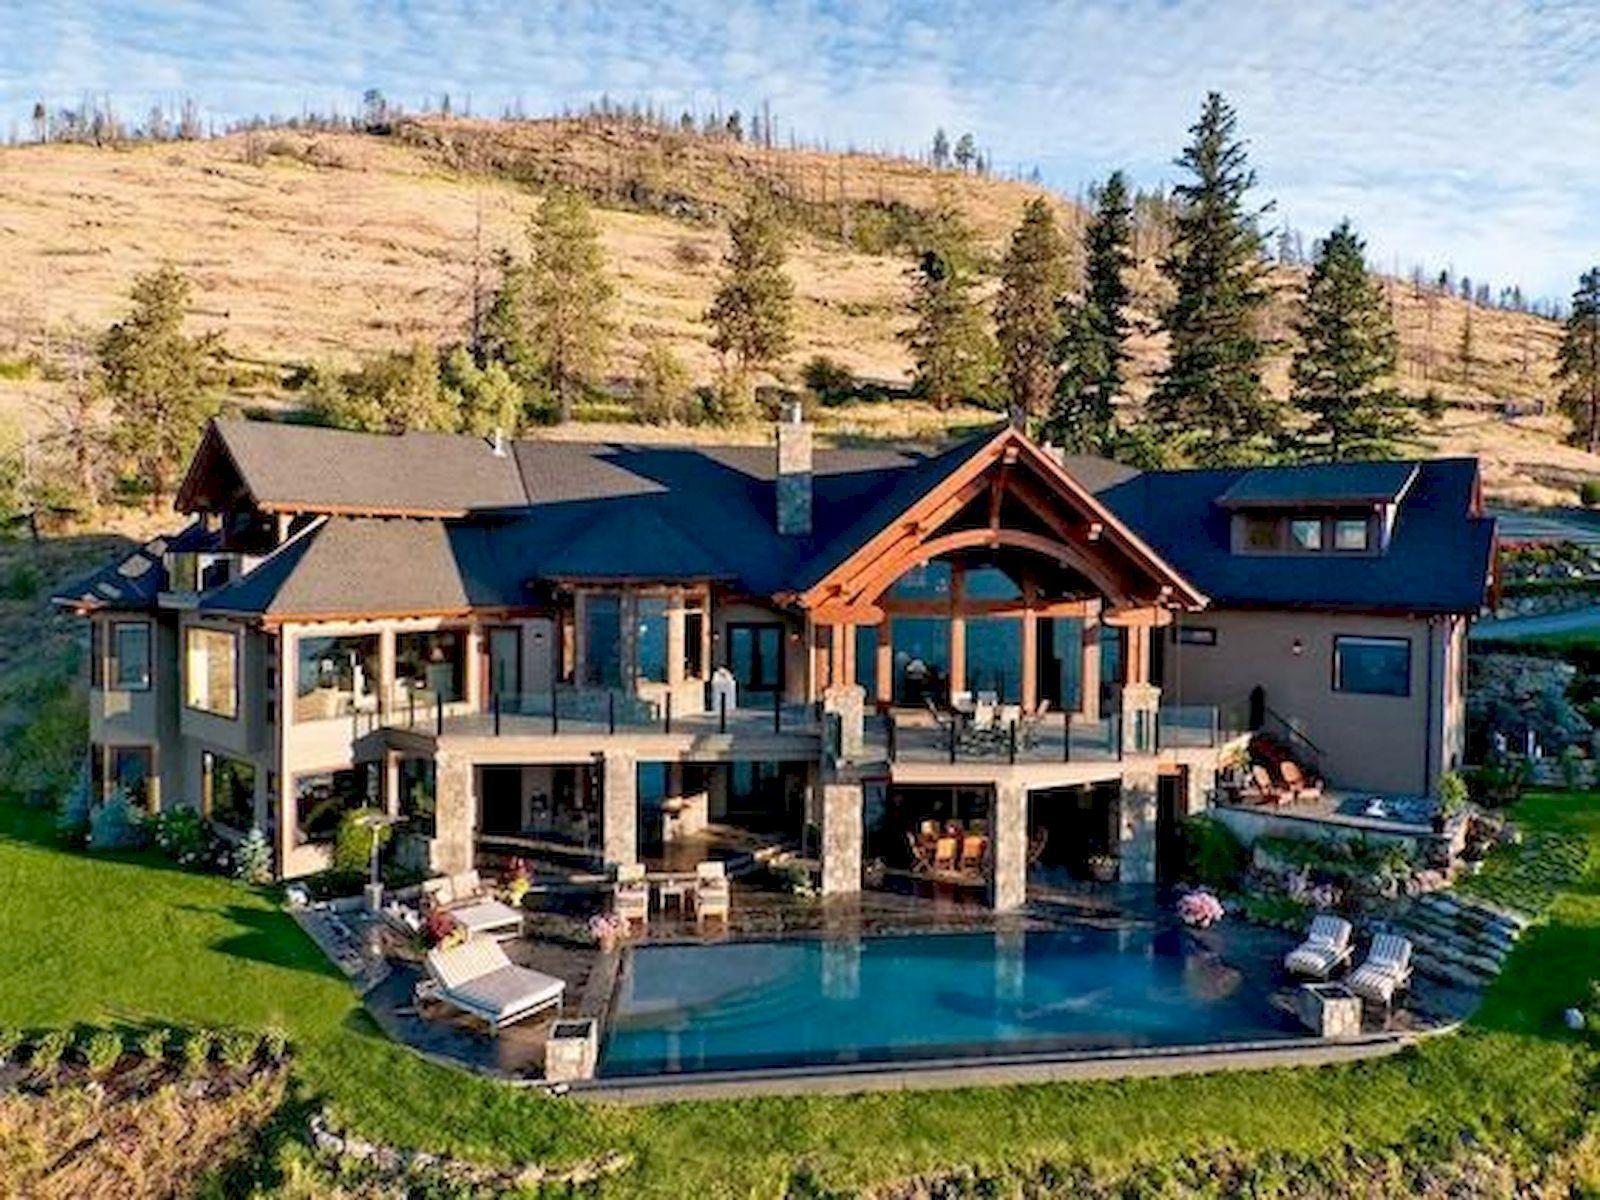 70 Most Popular Dream House Exterior Design Ideas Haus Aussendesign Hauswand Aussengestaltung